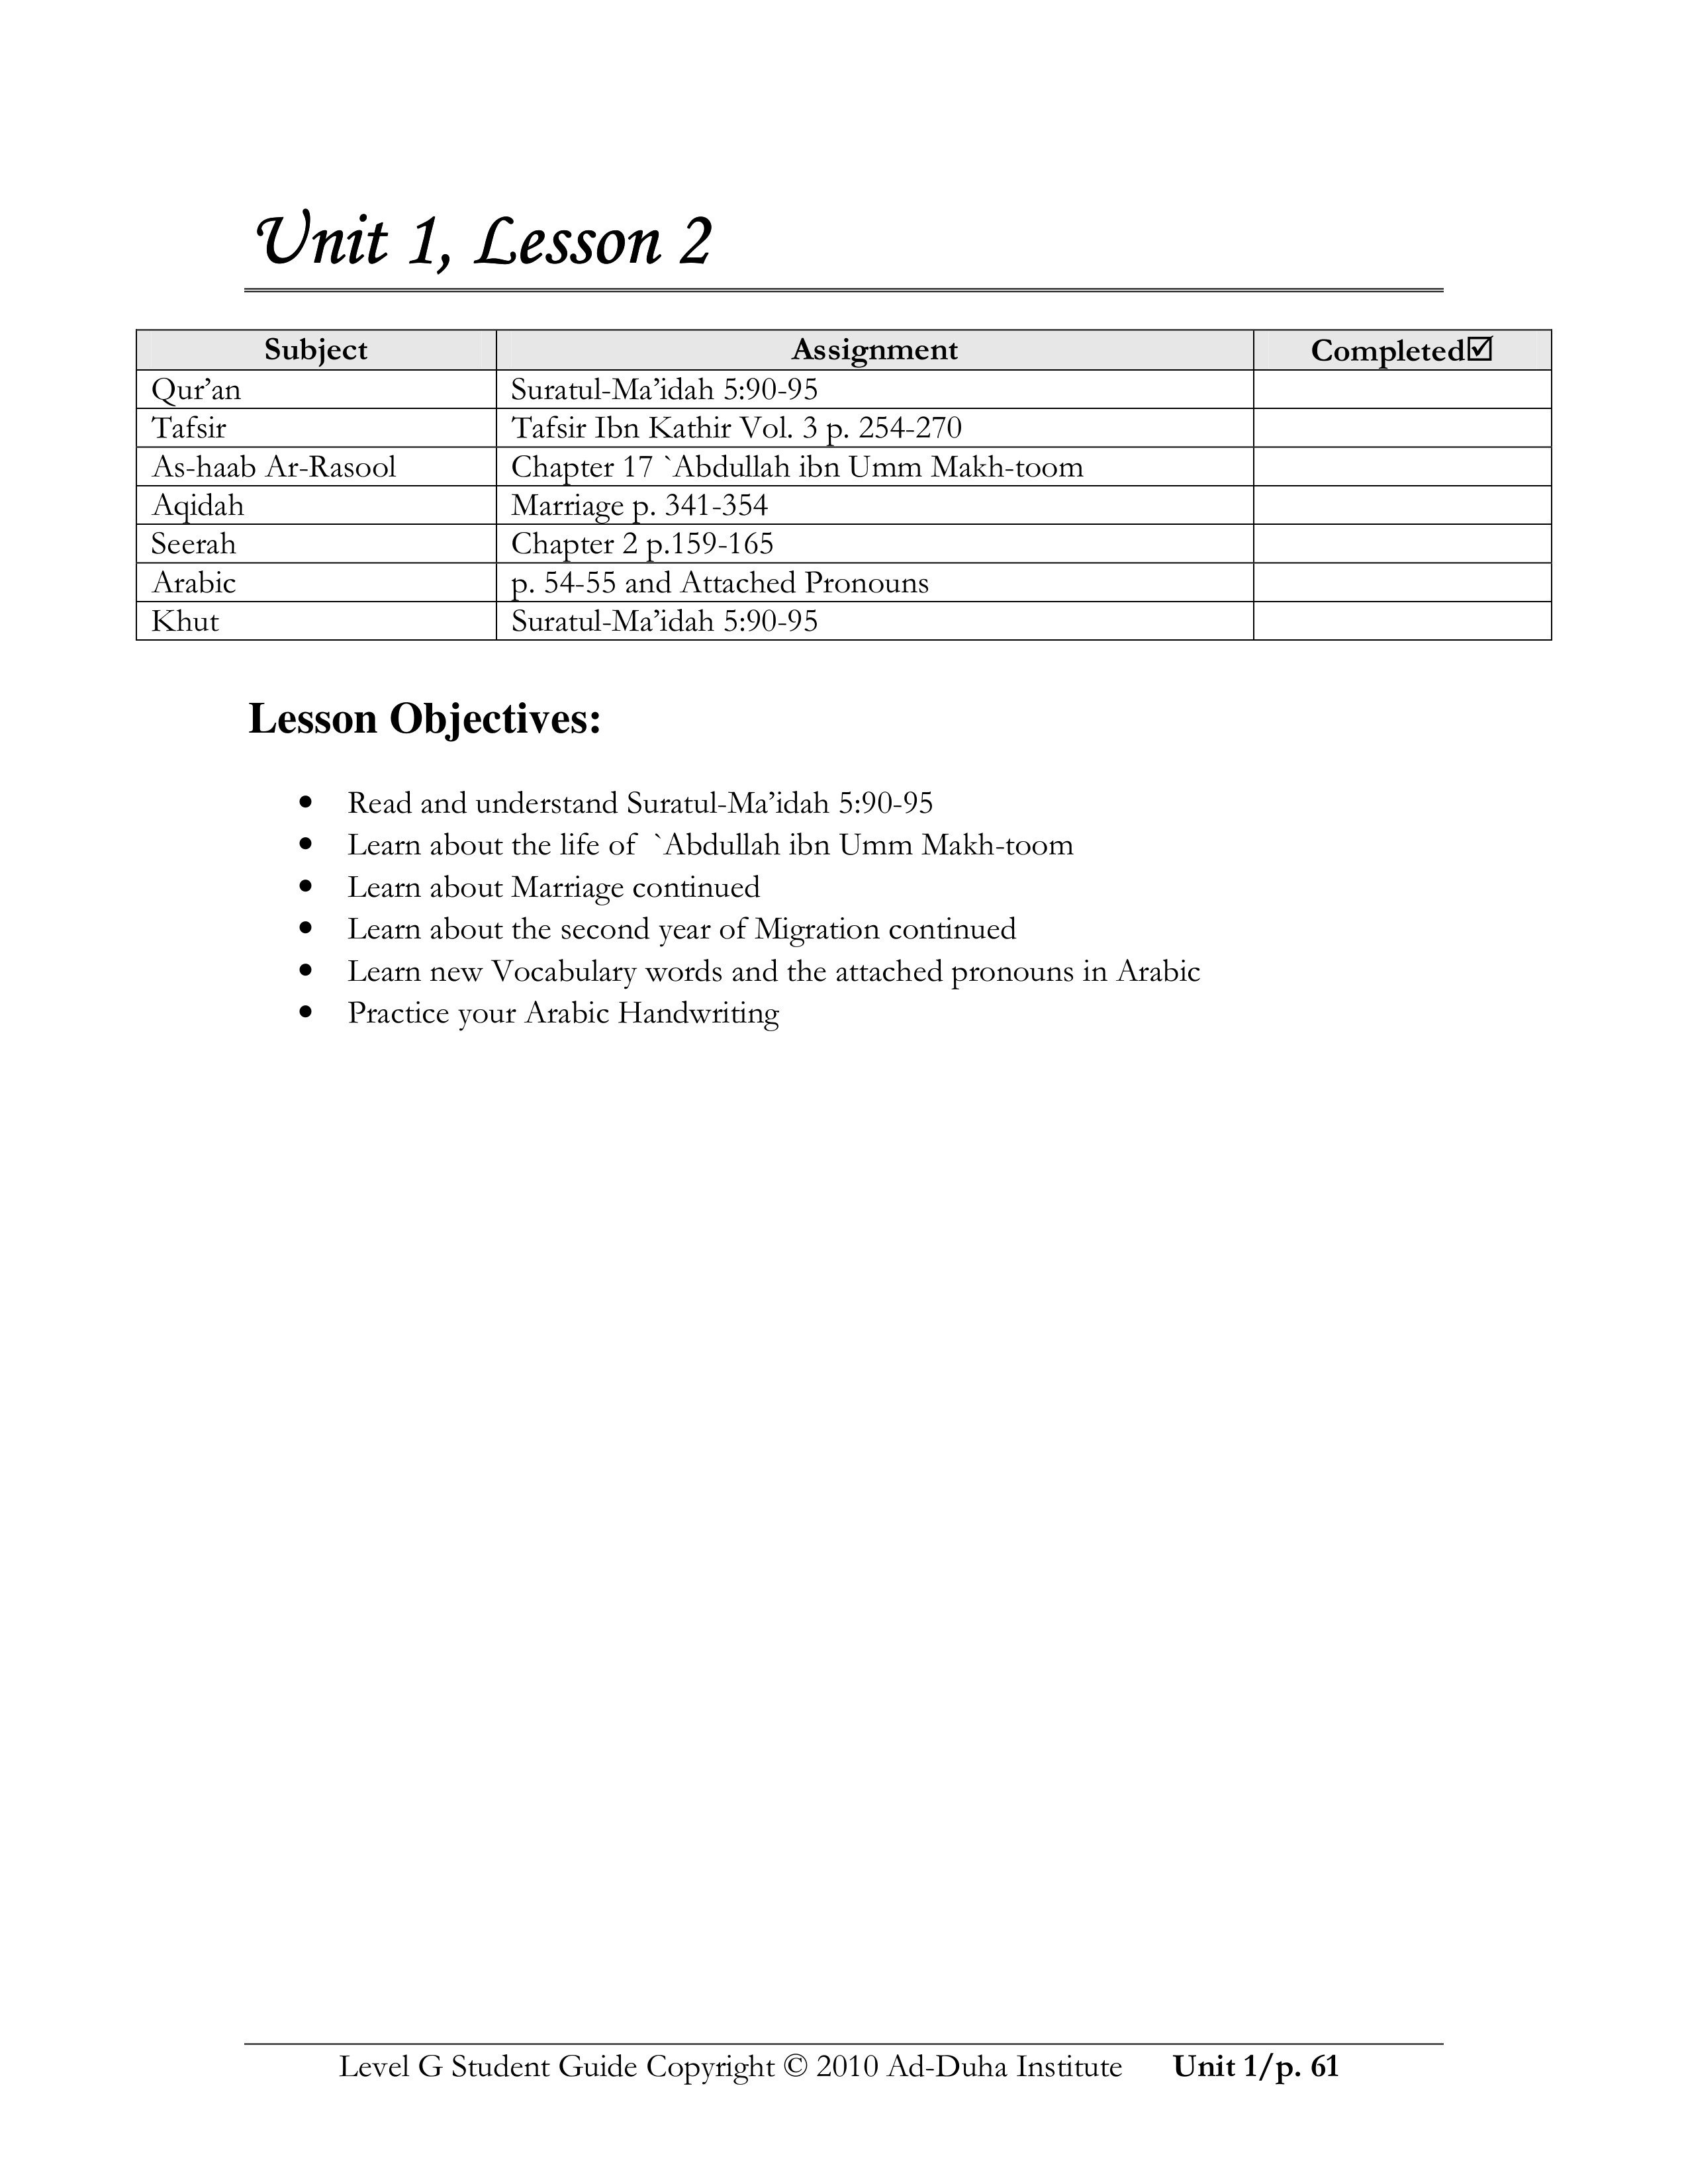 Level G Islamic Studies & Arabic Course: 8th-9th Grade